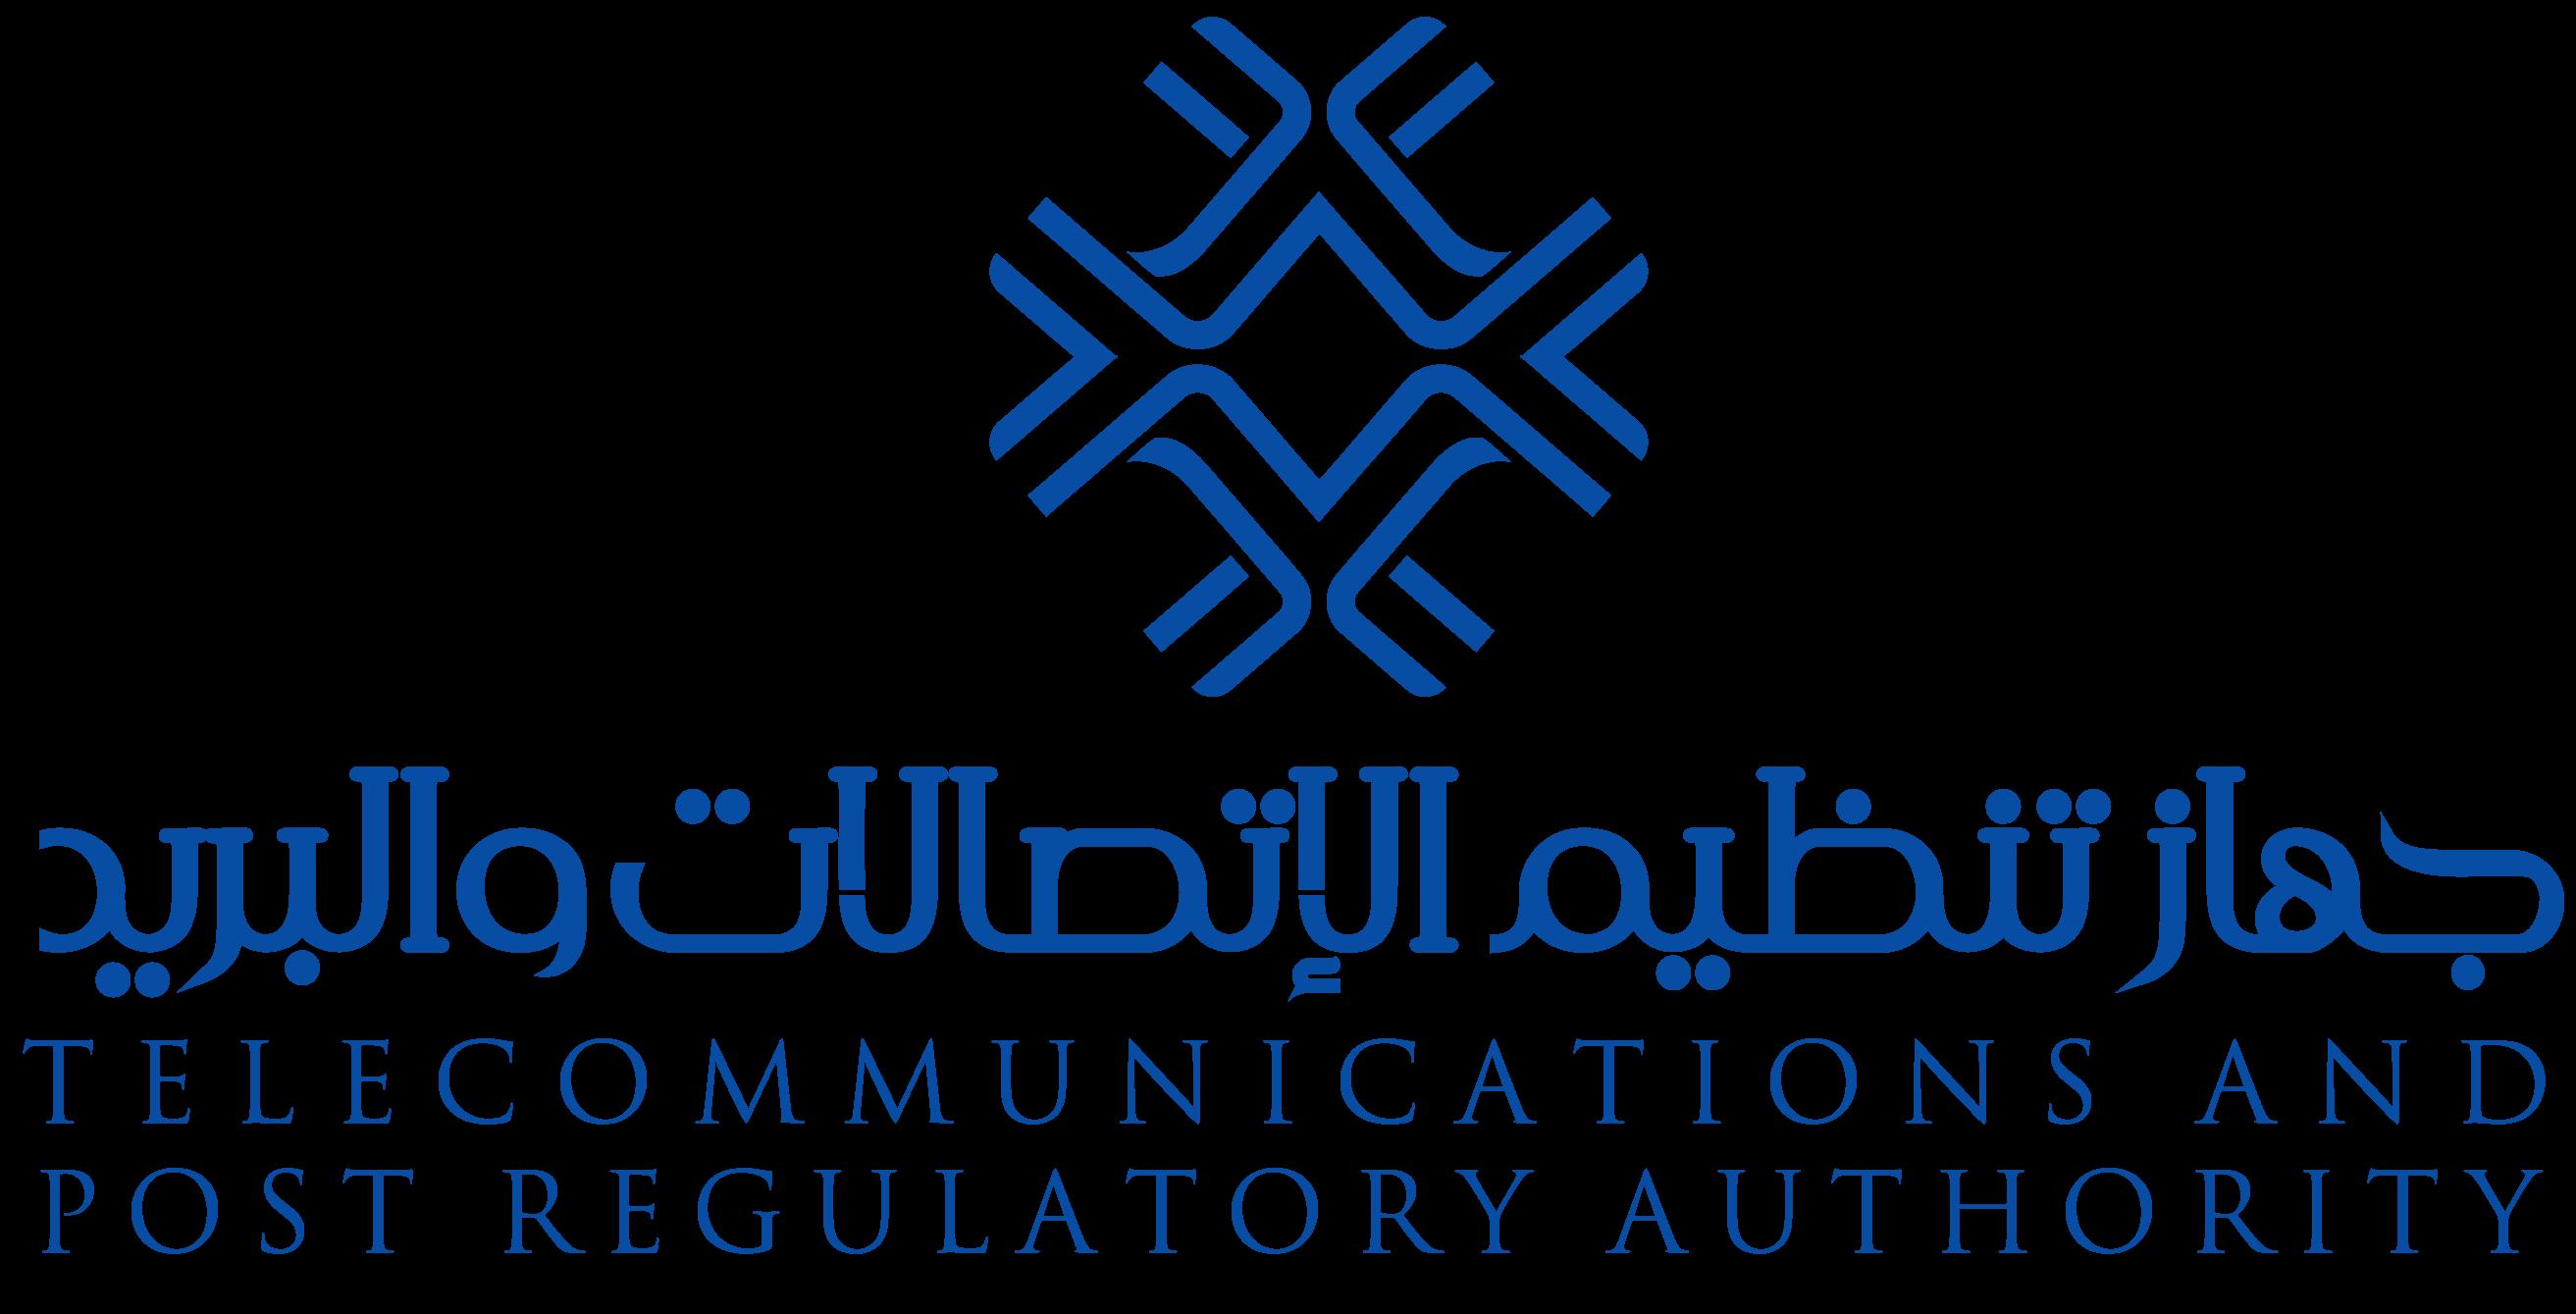 SUDAN TRA iVMS GPS GPRS AVL TRACKING